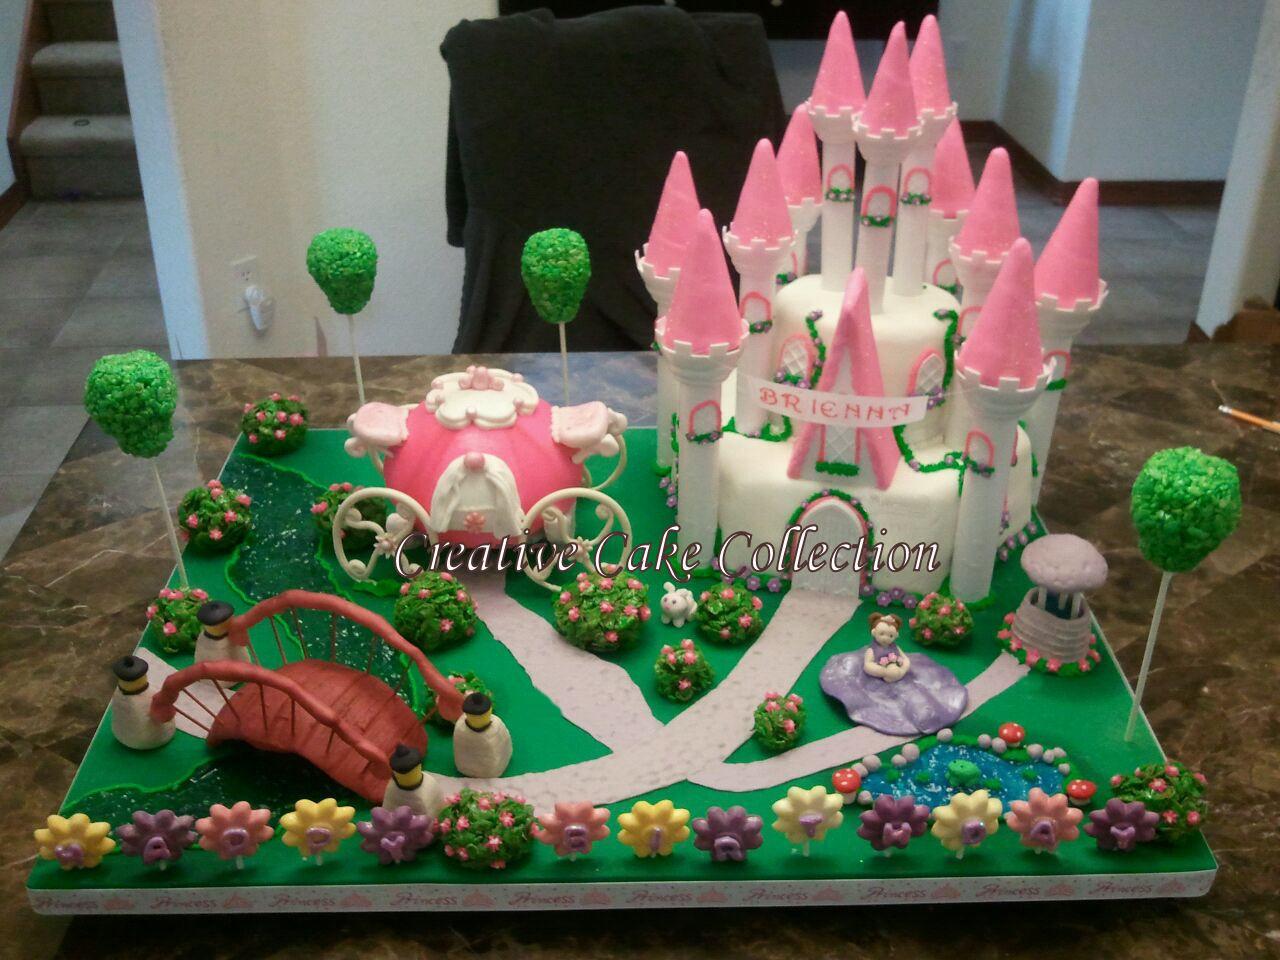 Creative Cake Collection Denver Bakeries Designer Cupcake Stands